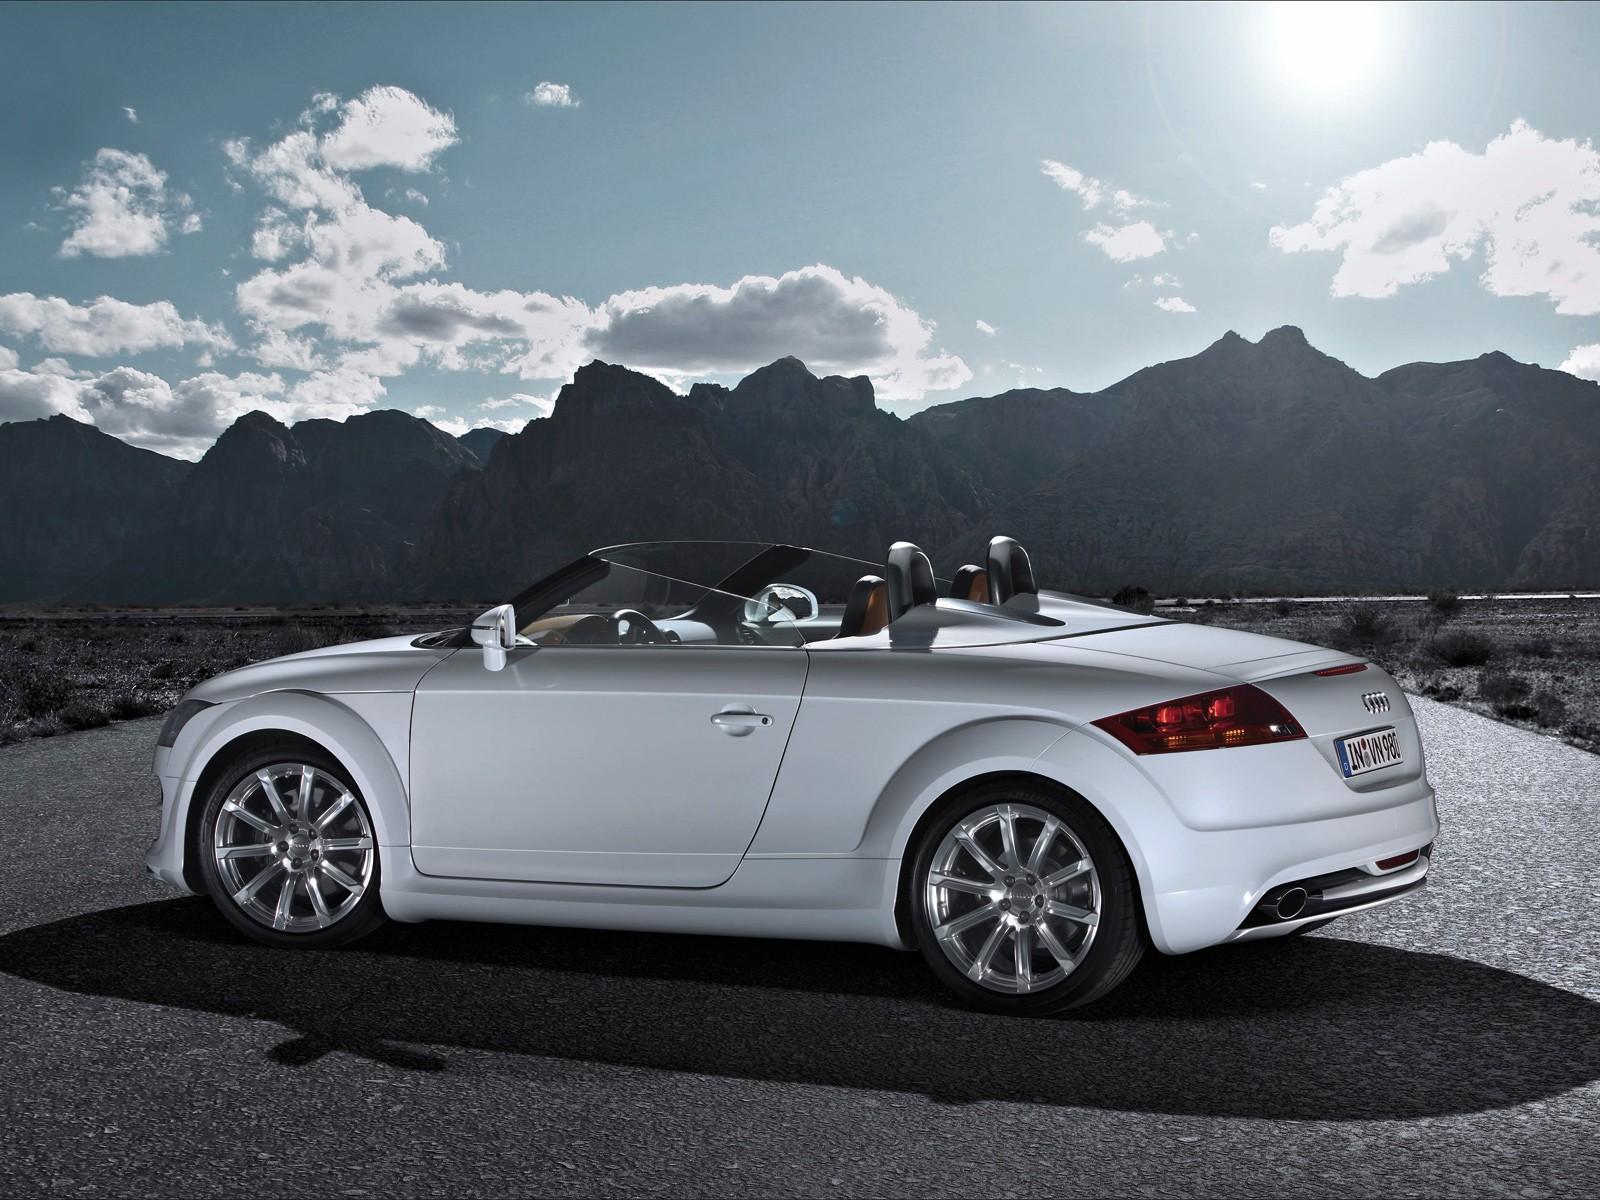 http://4.bp.blogspot.com/-LI3qefQ_PFA/TdBrpXPW5NI/AAAAAAAAAHM/yD-NP9iseOU/s1600/White-Audi-TT-Side-Angle-cars-wallpapers.jpg